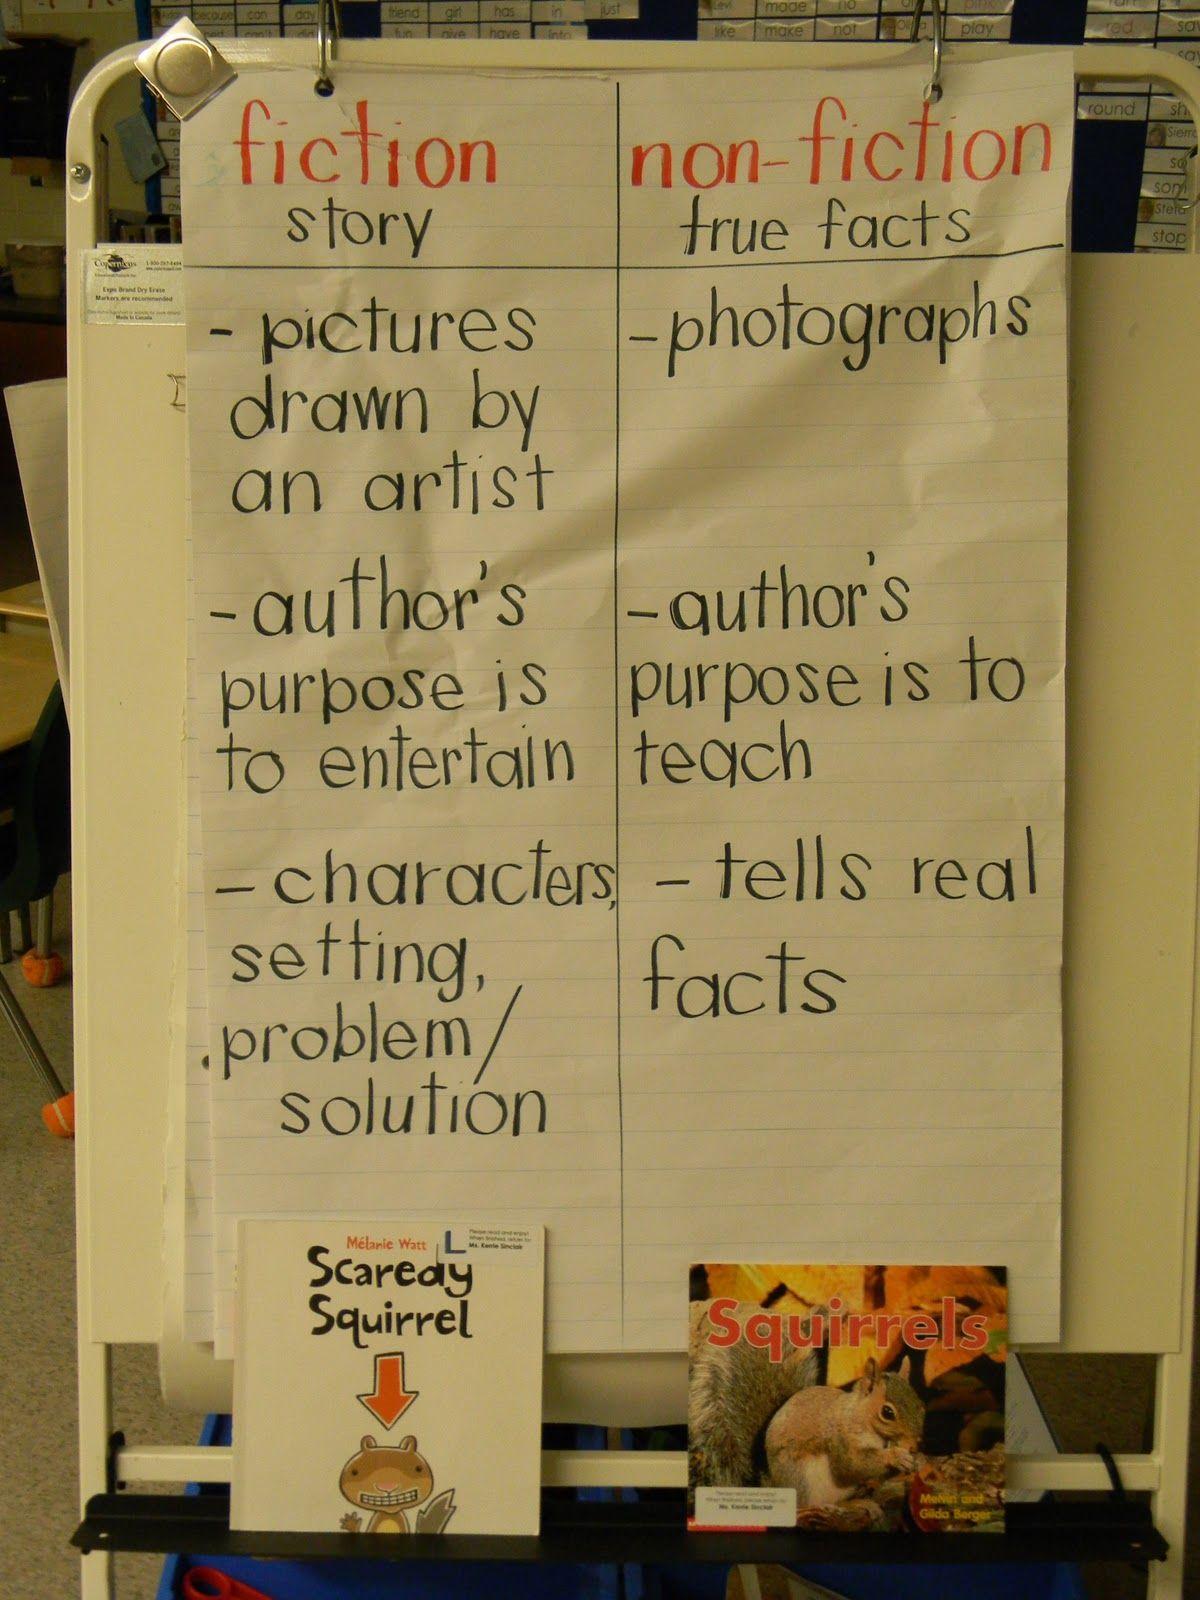 Venn diagram on fiction vs nonfiction google search fiction vs venn diagram on fiction vs nonfiction google search pooptronica